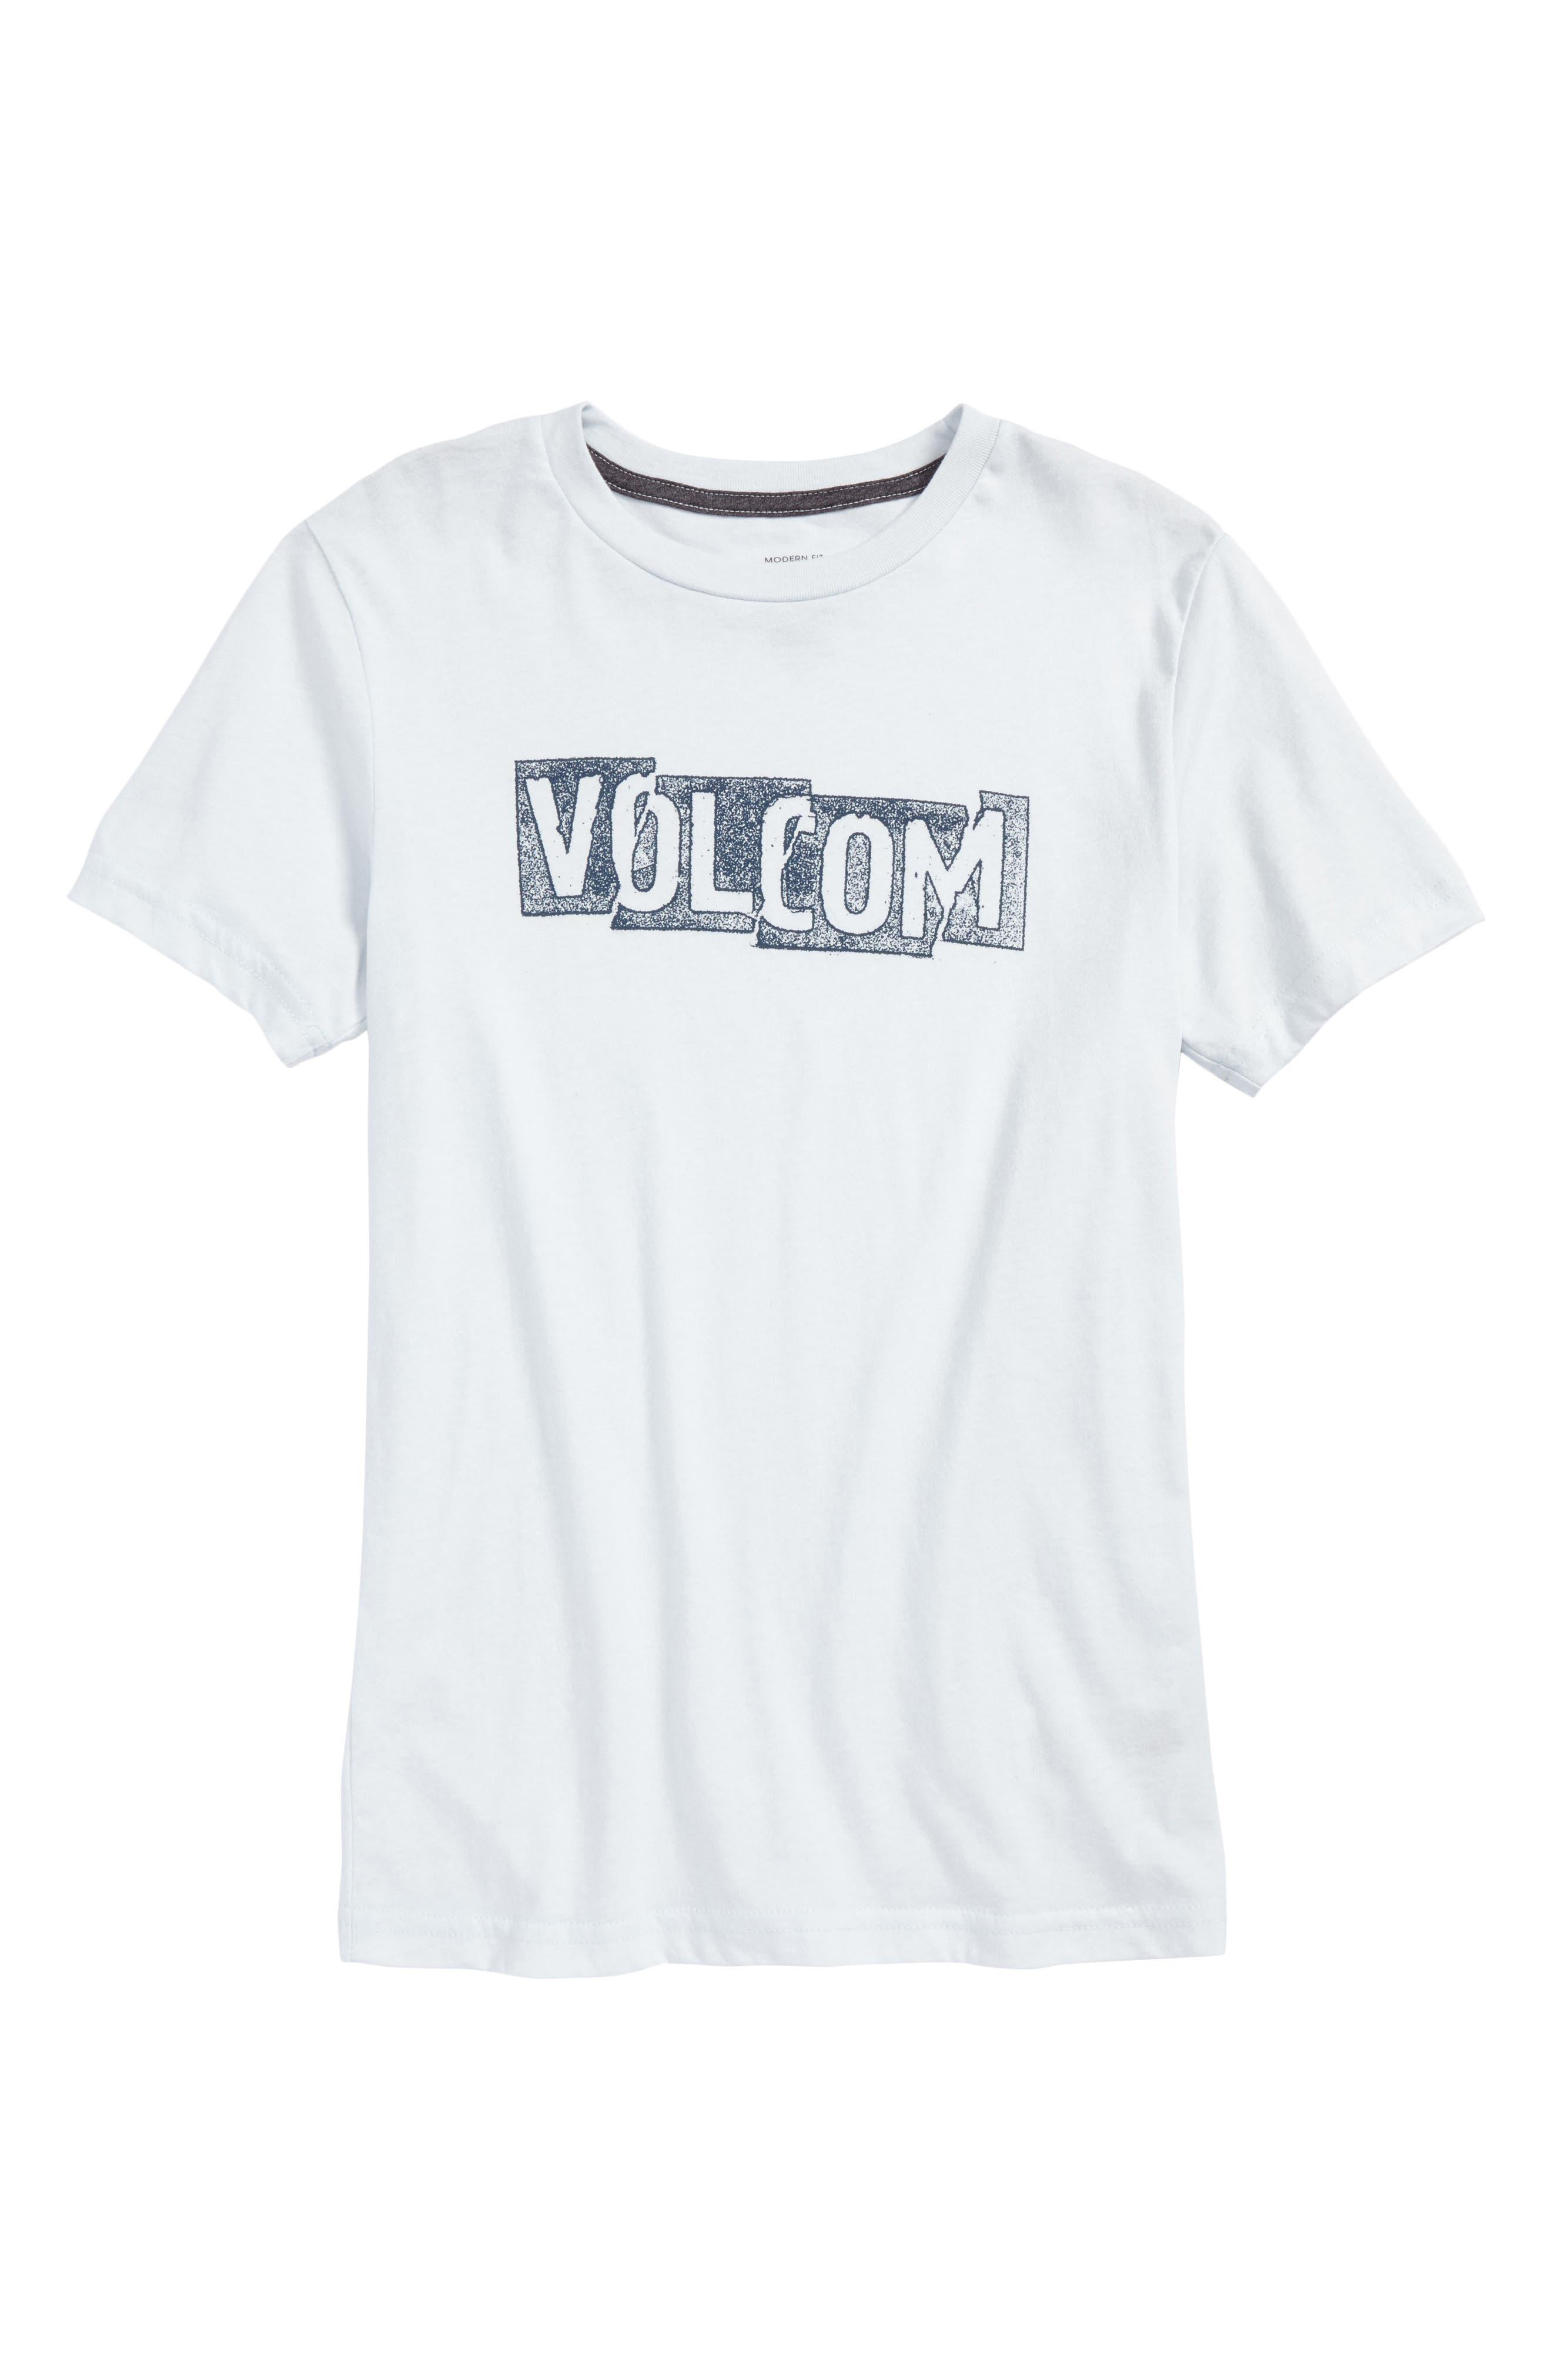 Edge Graphic T-Shirt,                             Main thumbnail 1, color,                             White